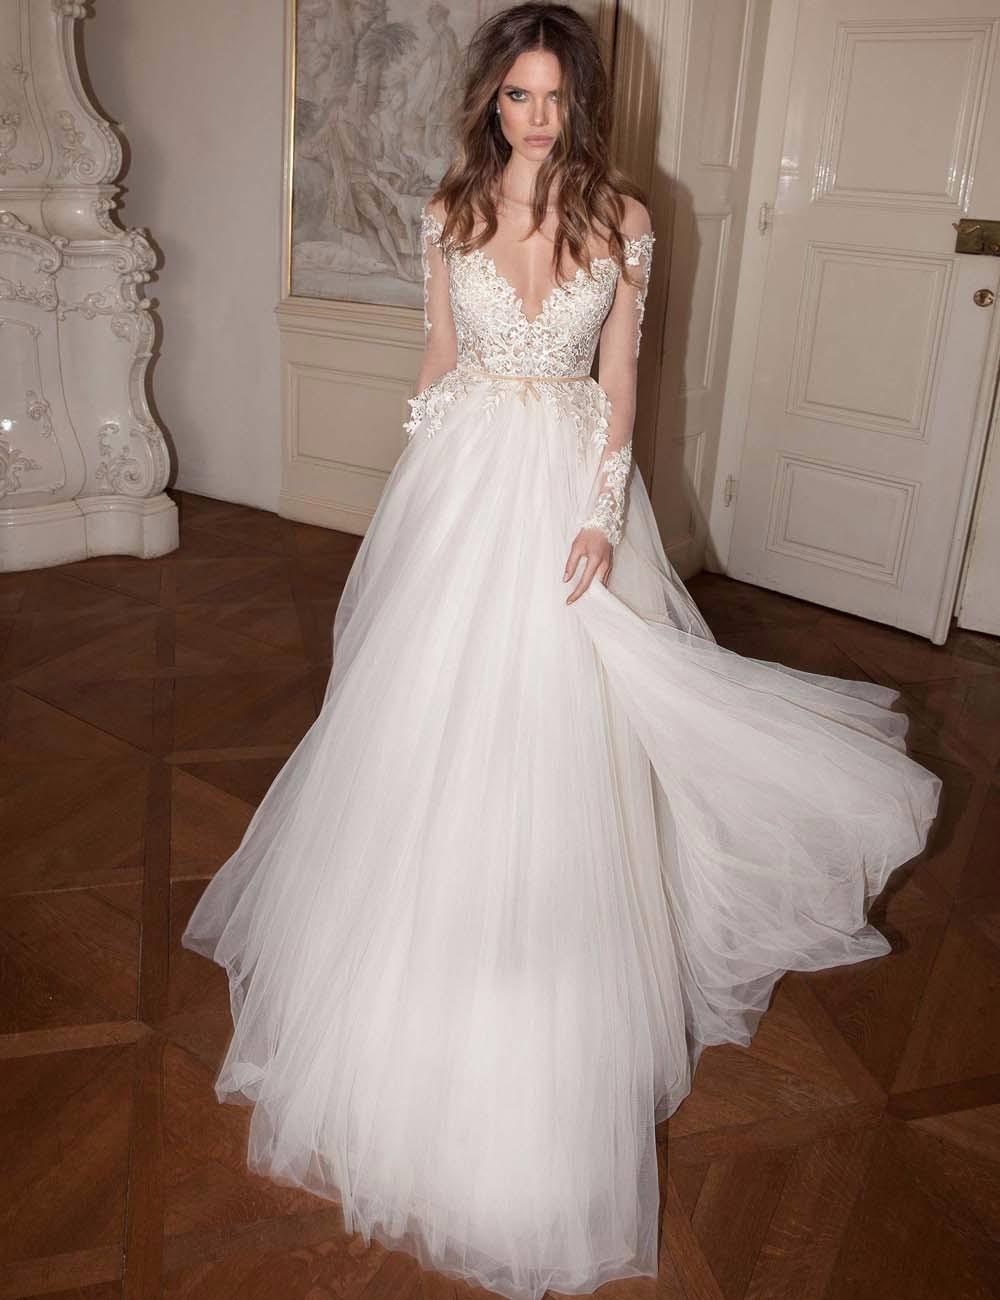 2016 Ball Gown Off Shoulder Long Sleeve Elegant Vestidos De Novia White Lace Wedding Dresses Robe De Mariage Bridal Gown